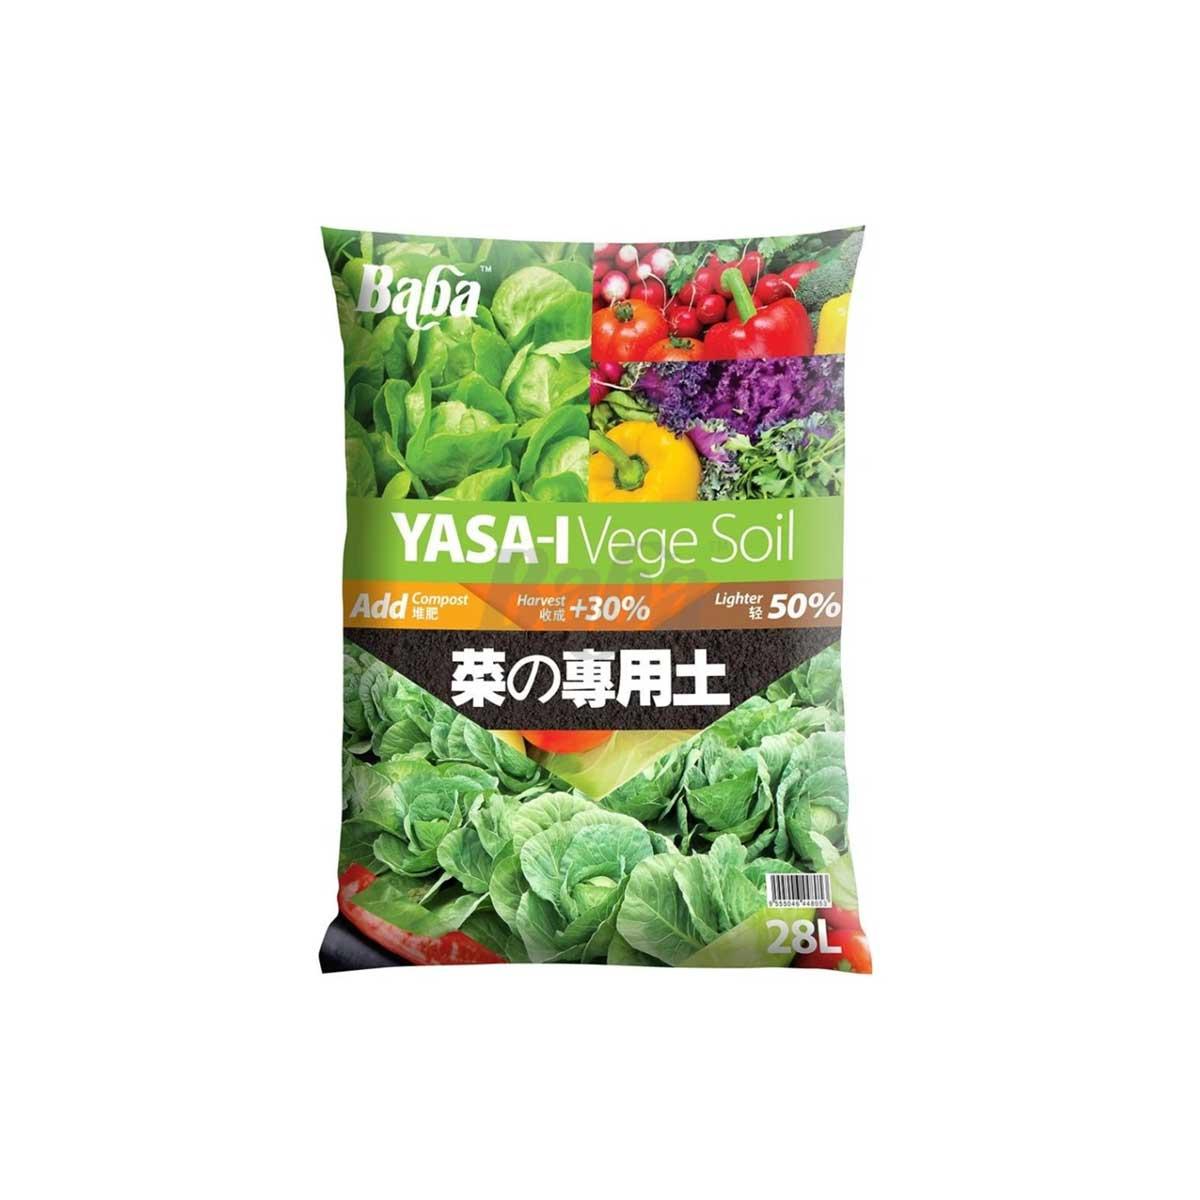 Baba Yasa-i Vege Soil | Organic Soil